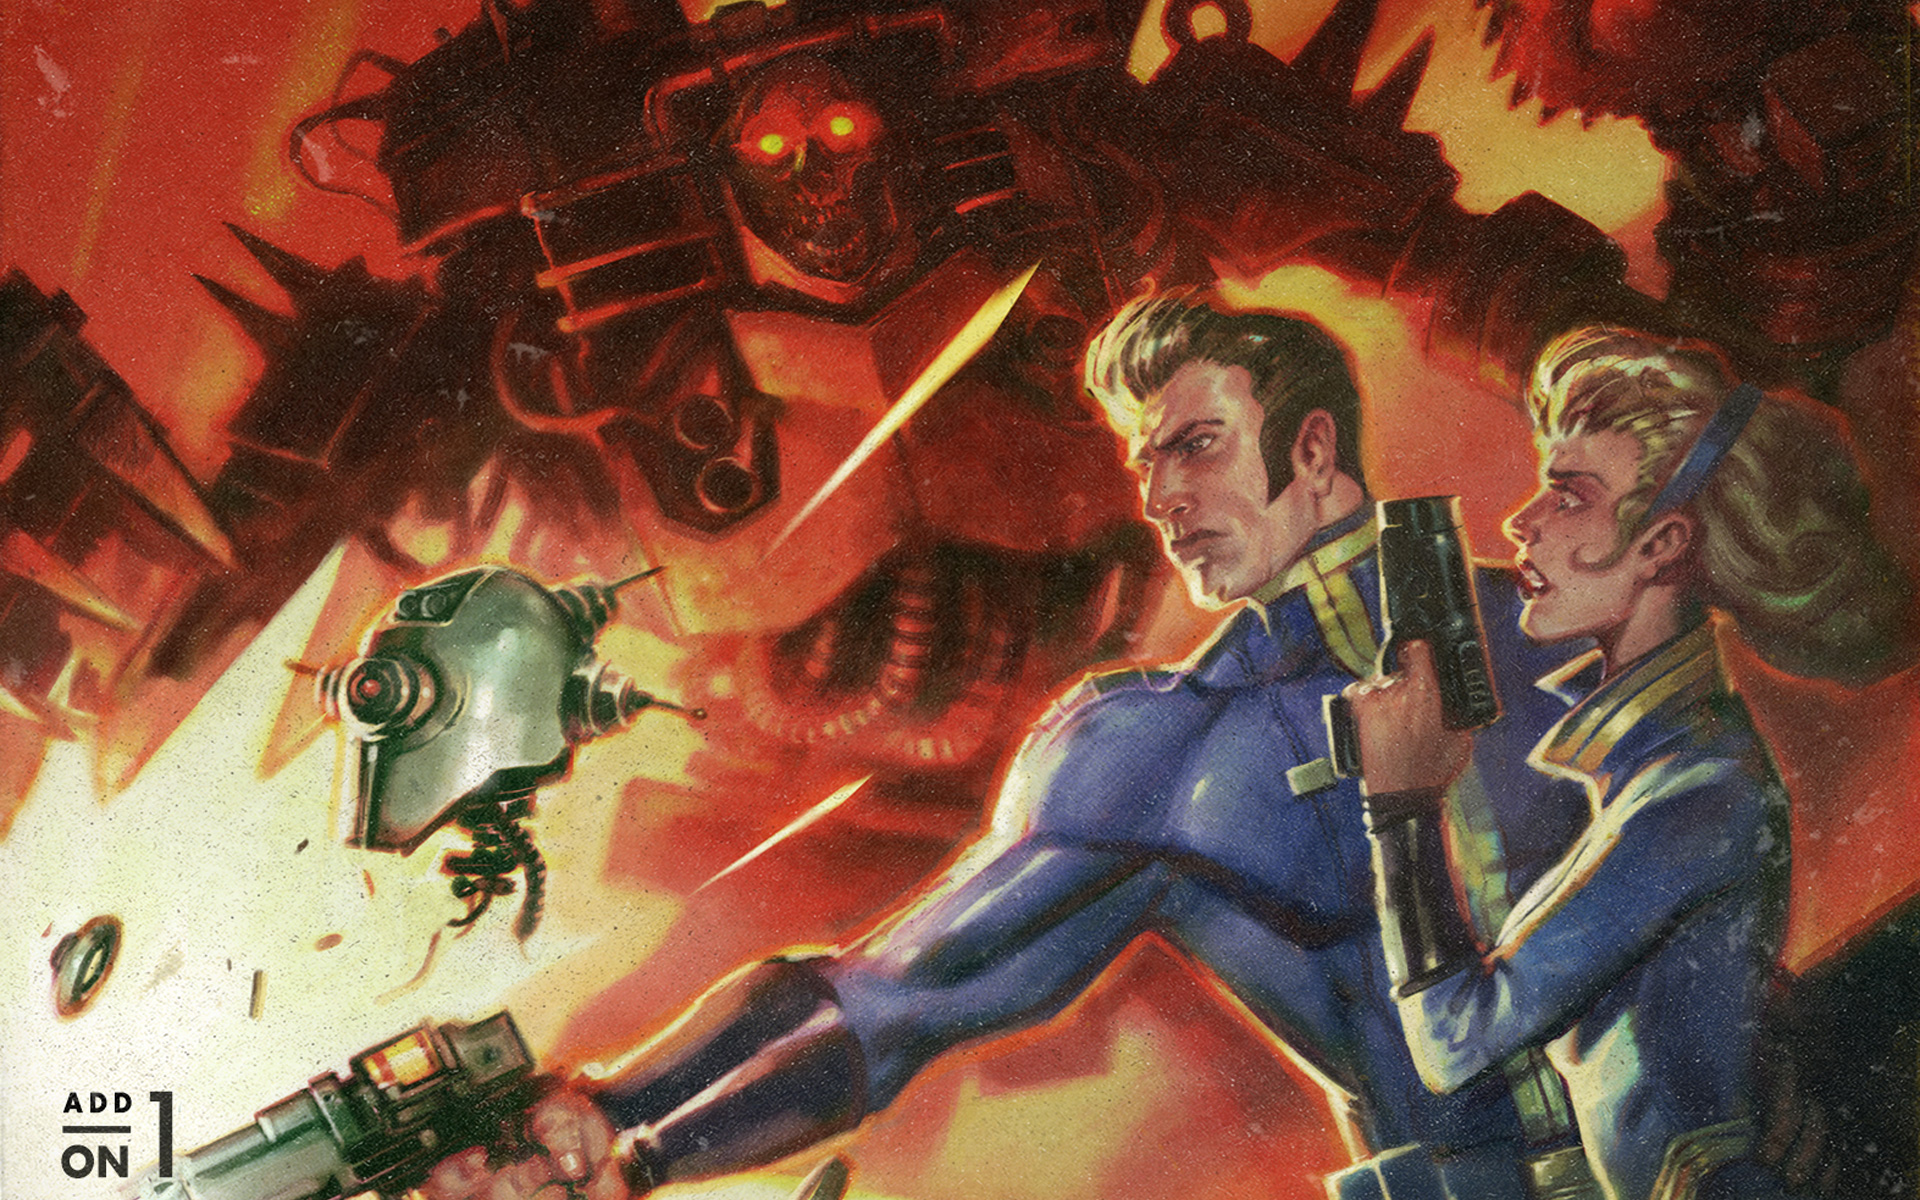 Fallout 4 Wallpaper in 1920x1200